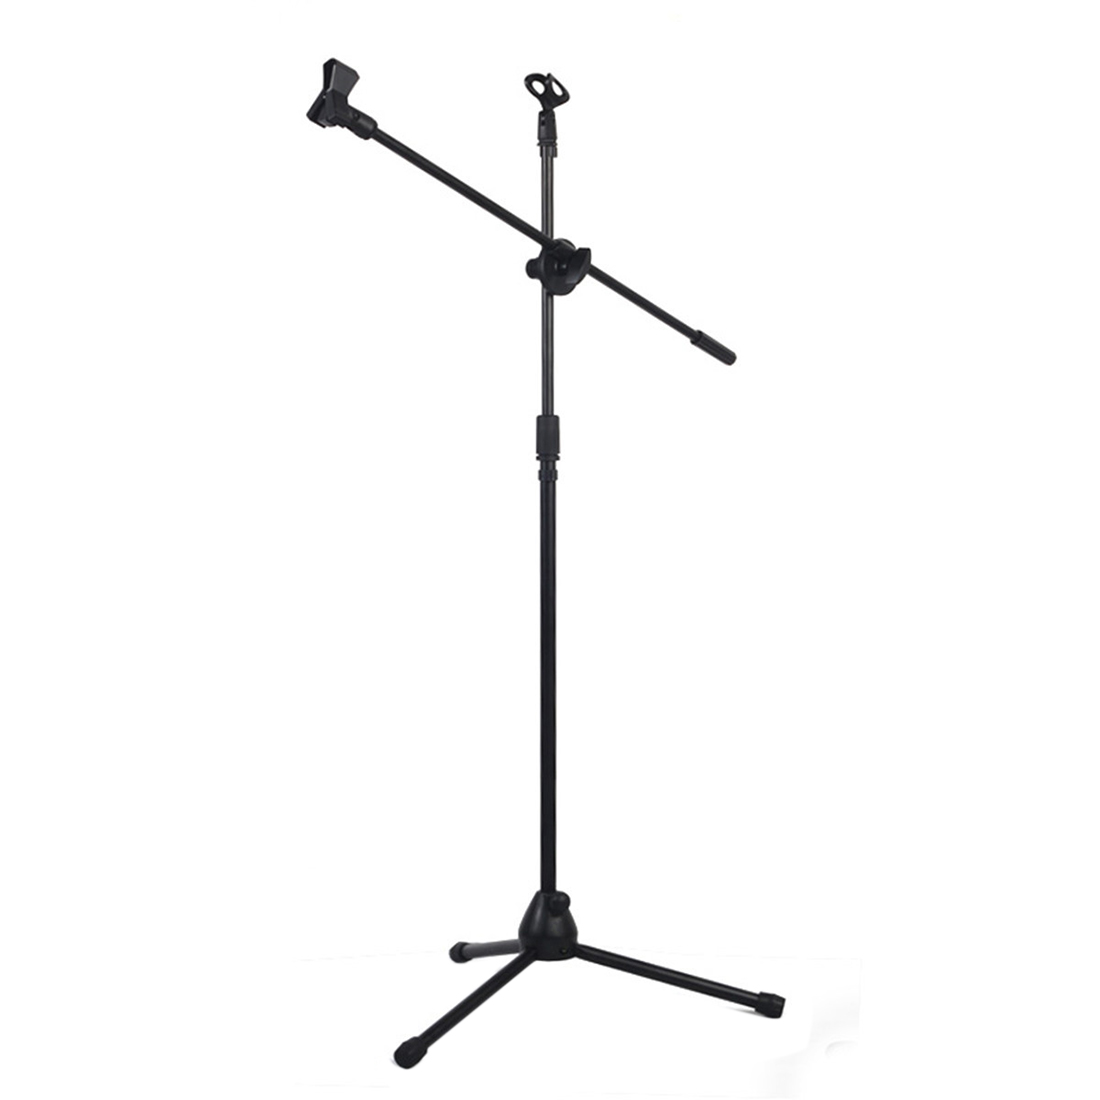 Professionale Altalena Boom Floor Stand Microphone Holder